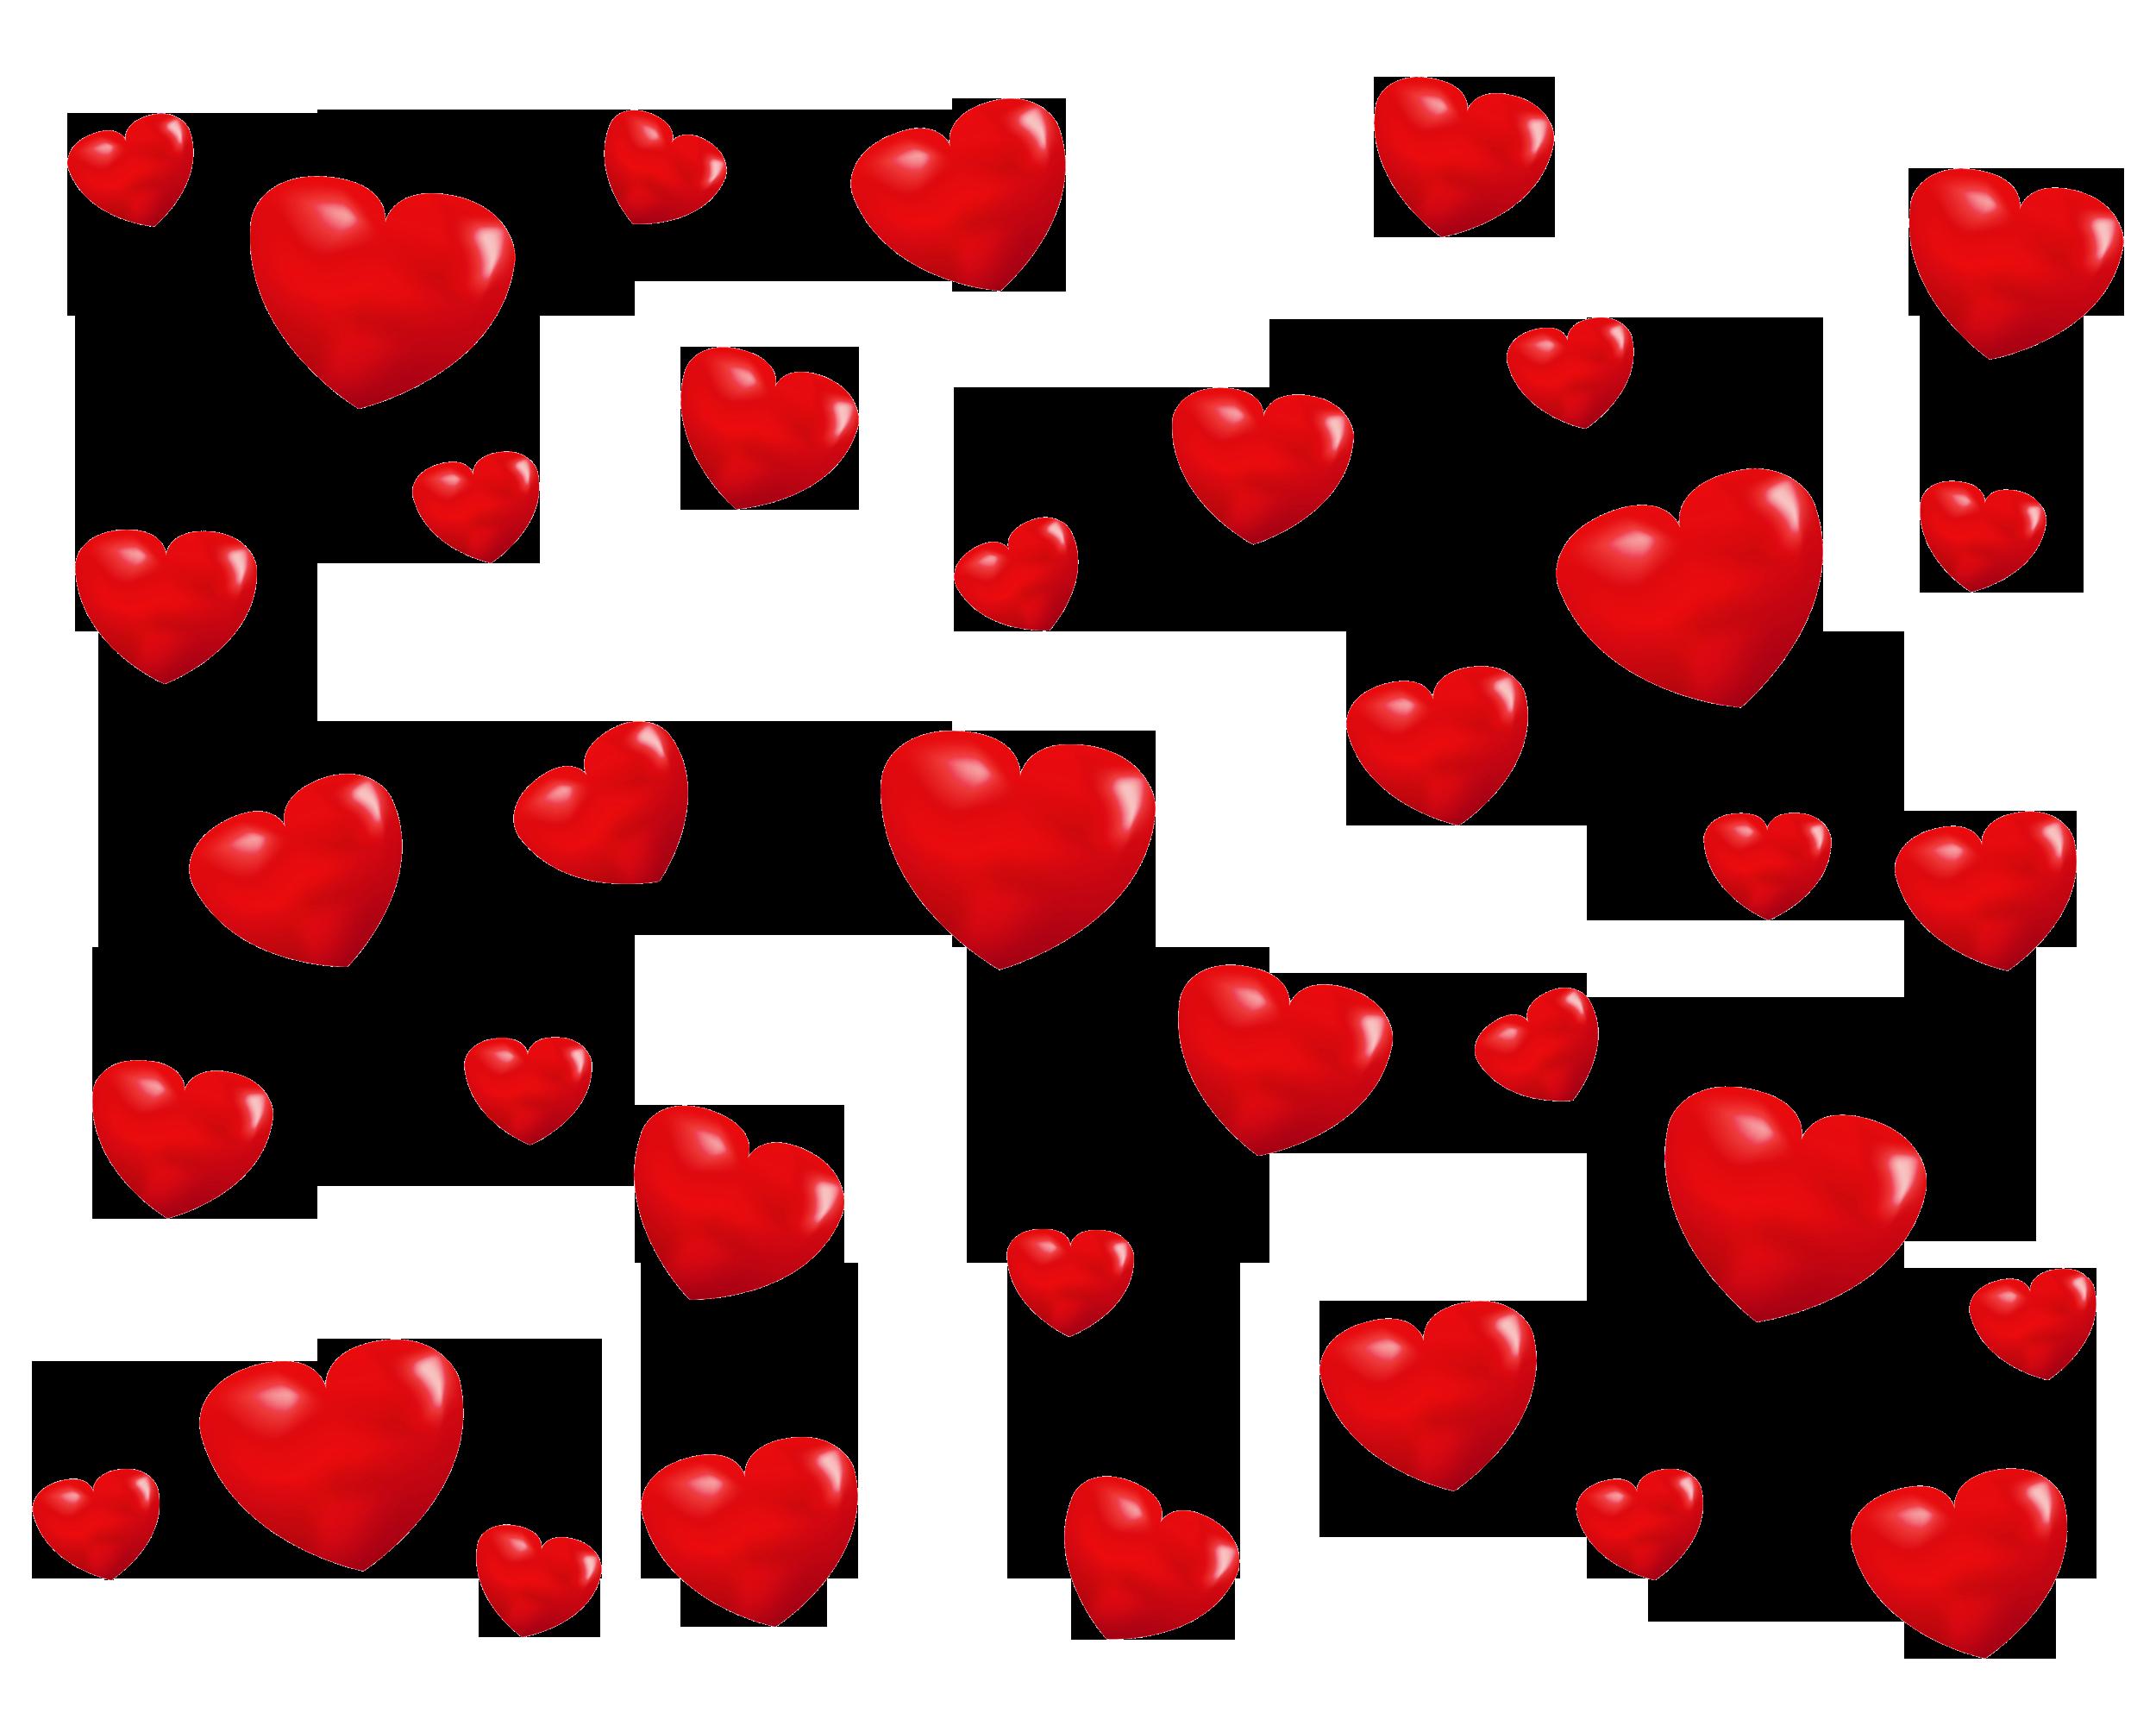 Clipart heart transparent background vector transparent stock Transparent PNG Background with Hearts   Gallery Yopriceville ... vector transparent stock